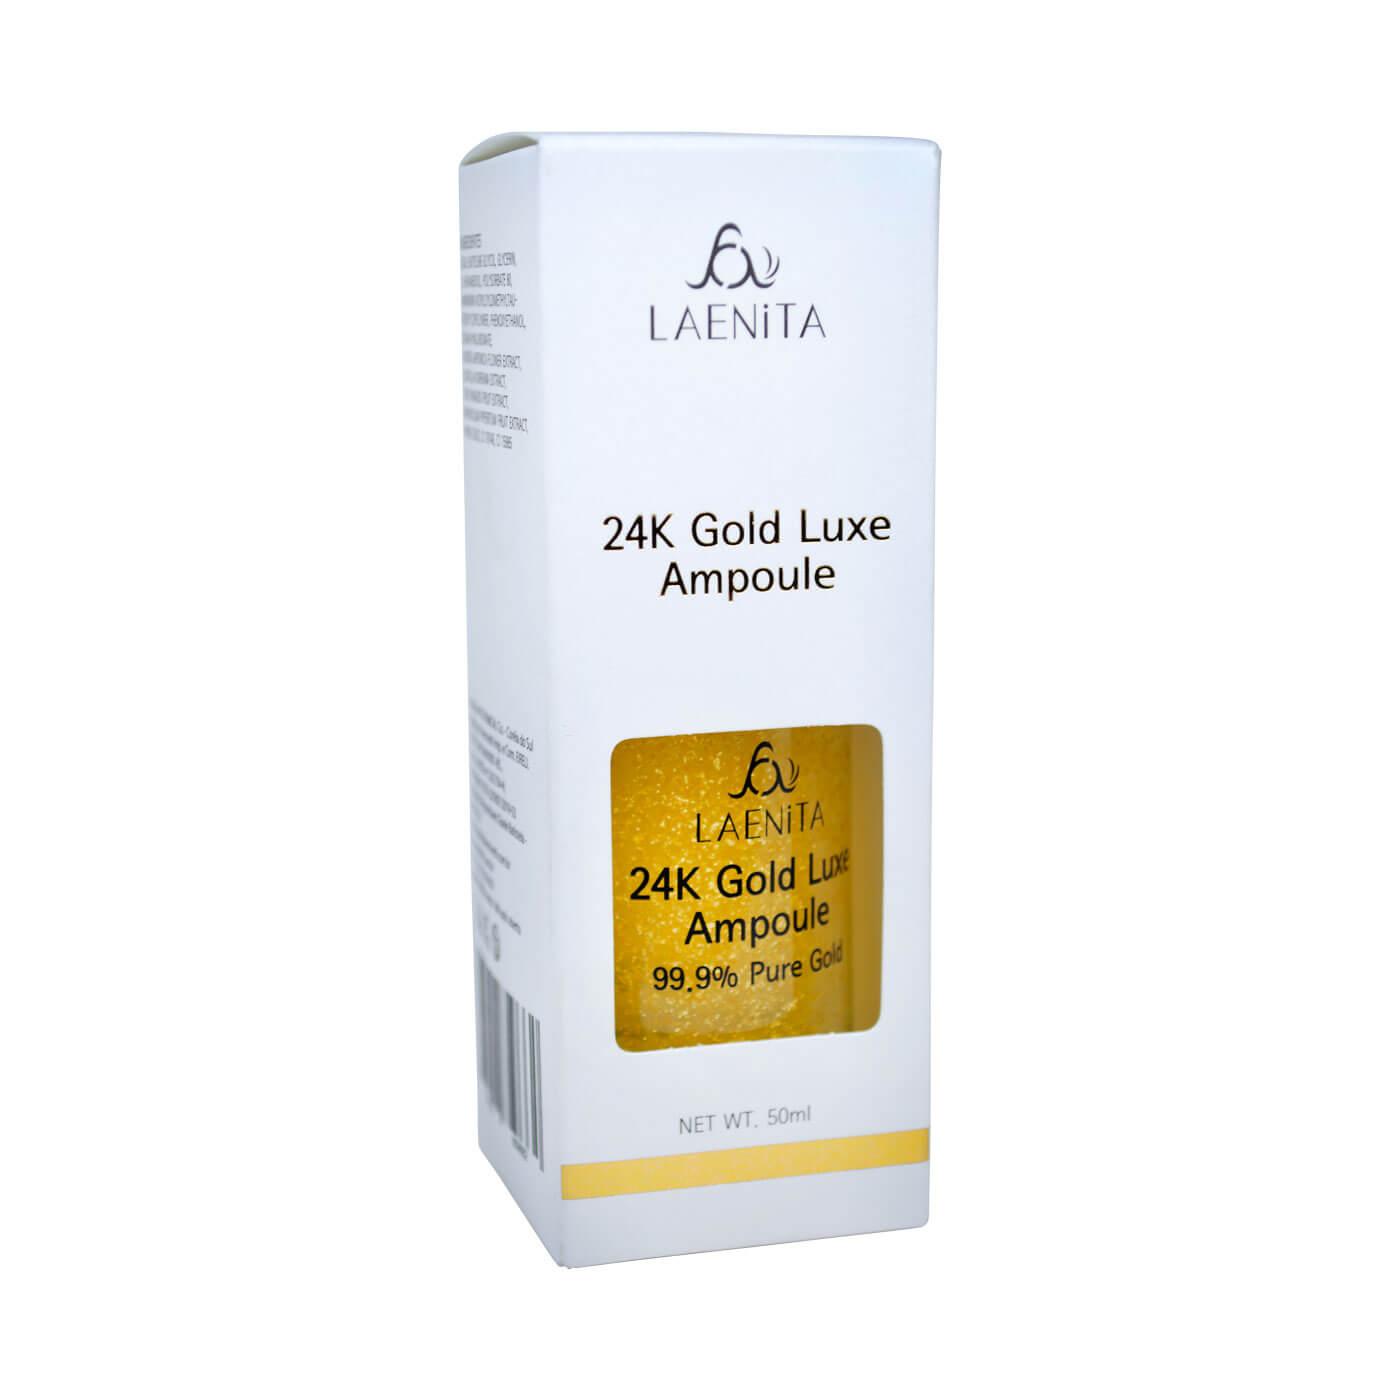 Serum Facial Laenita 24K Gold Luxe Ampoule